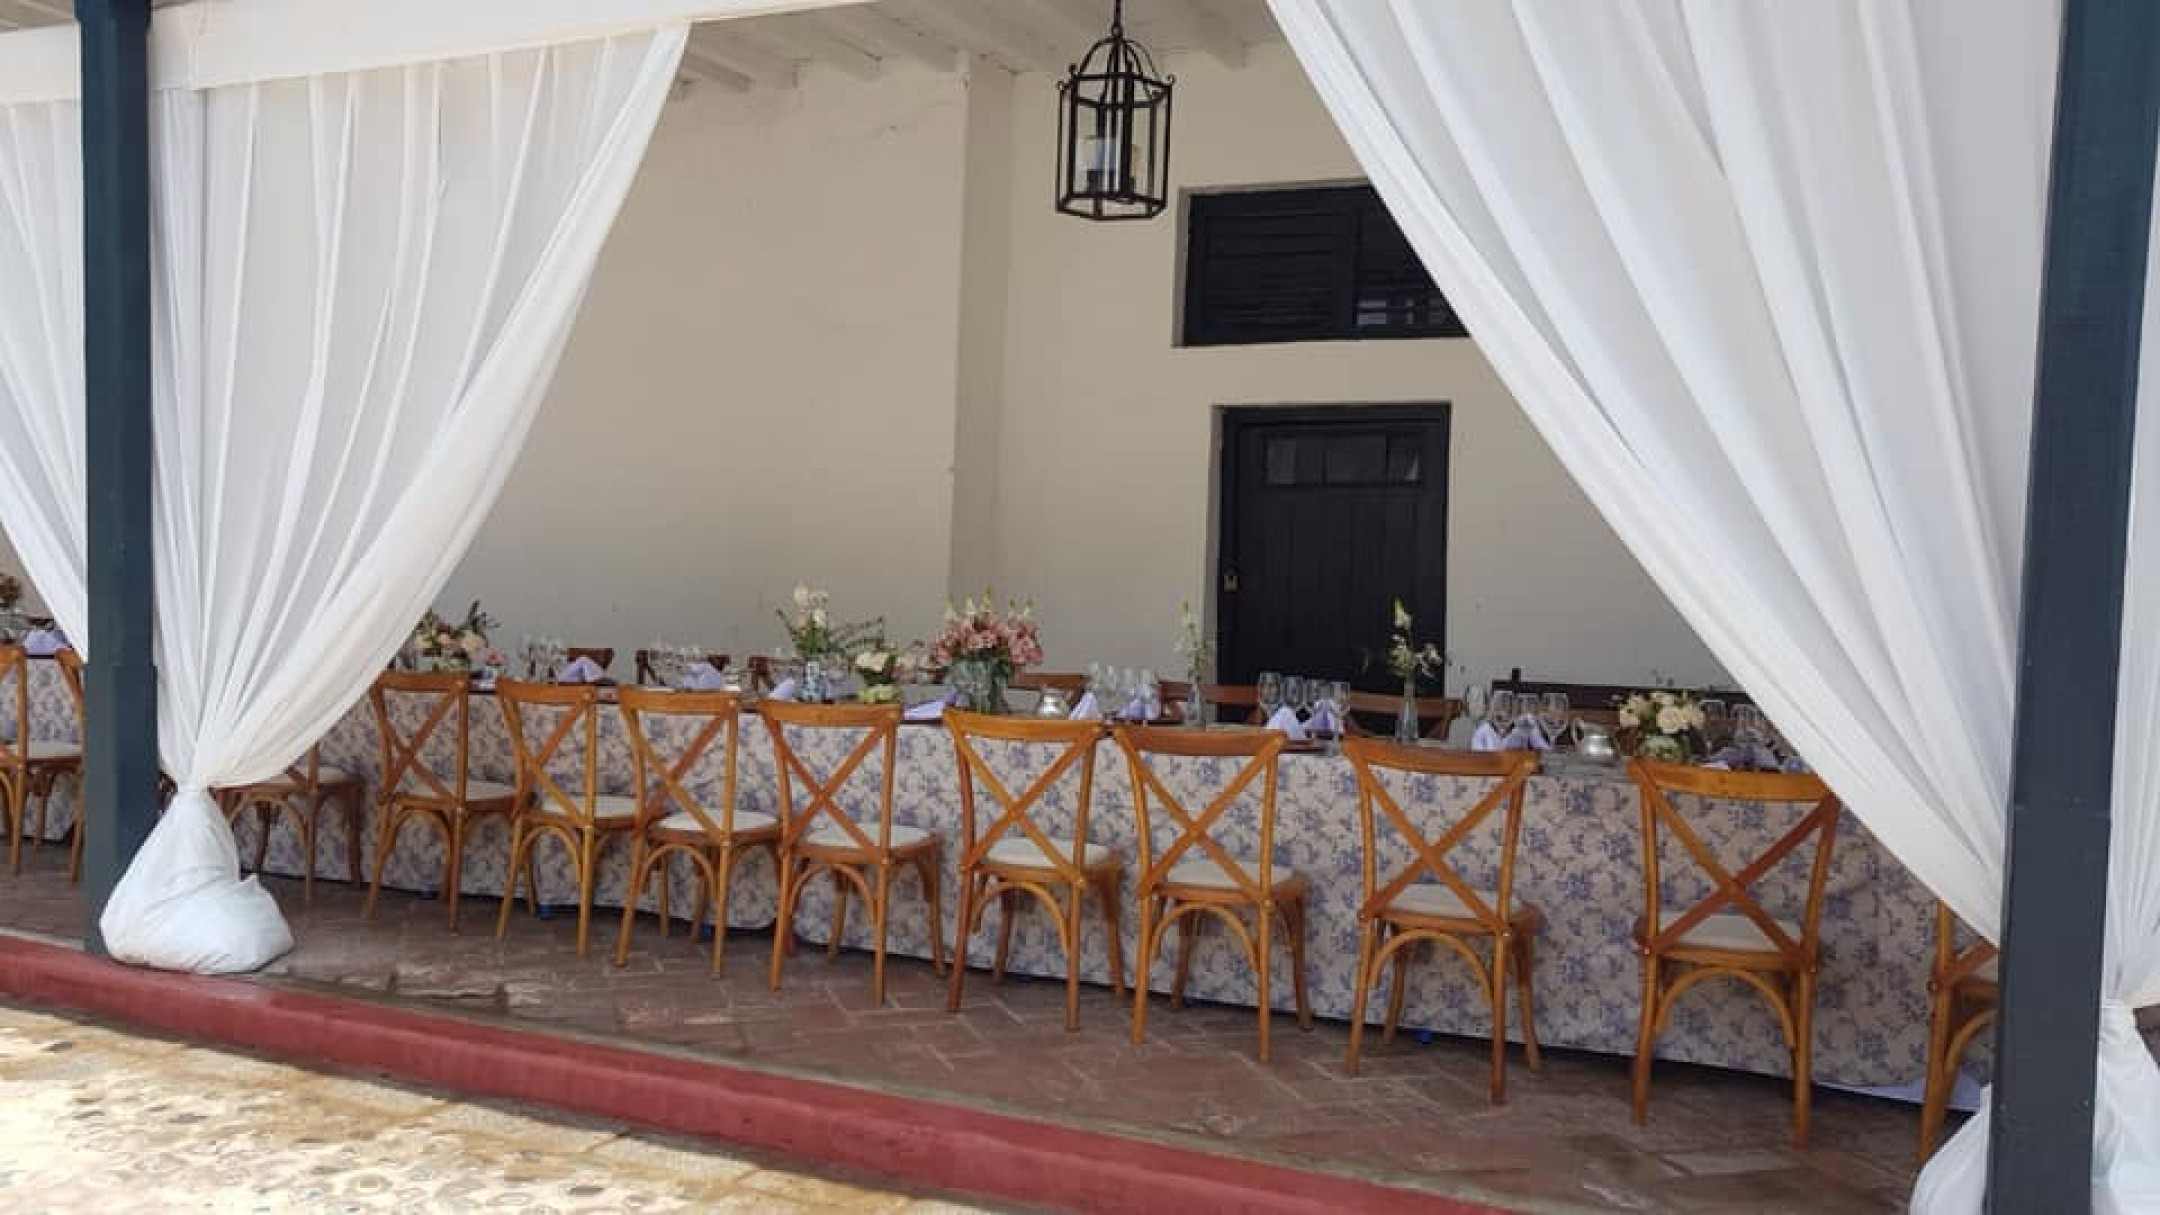 http://haciendabocanegra.com/images/chbn_dFQ9mOrt5S_large-1080_KP4Ka.jpg